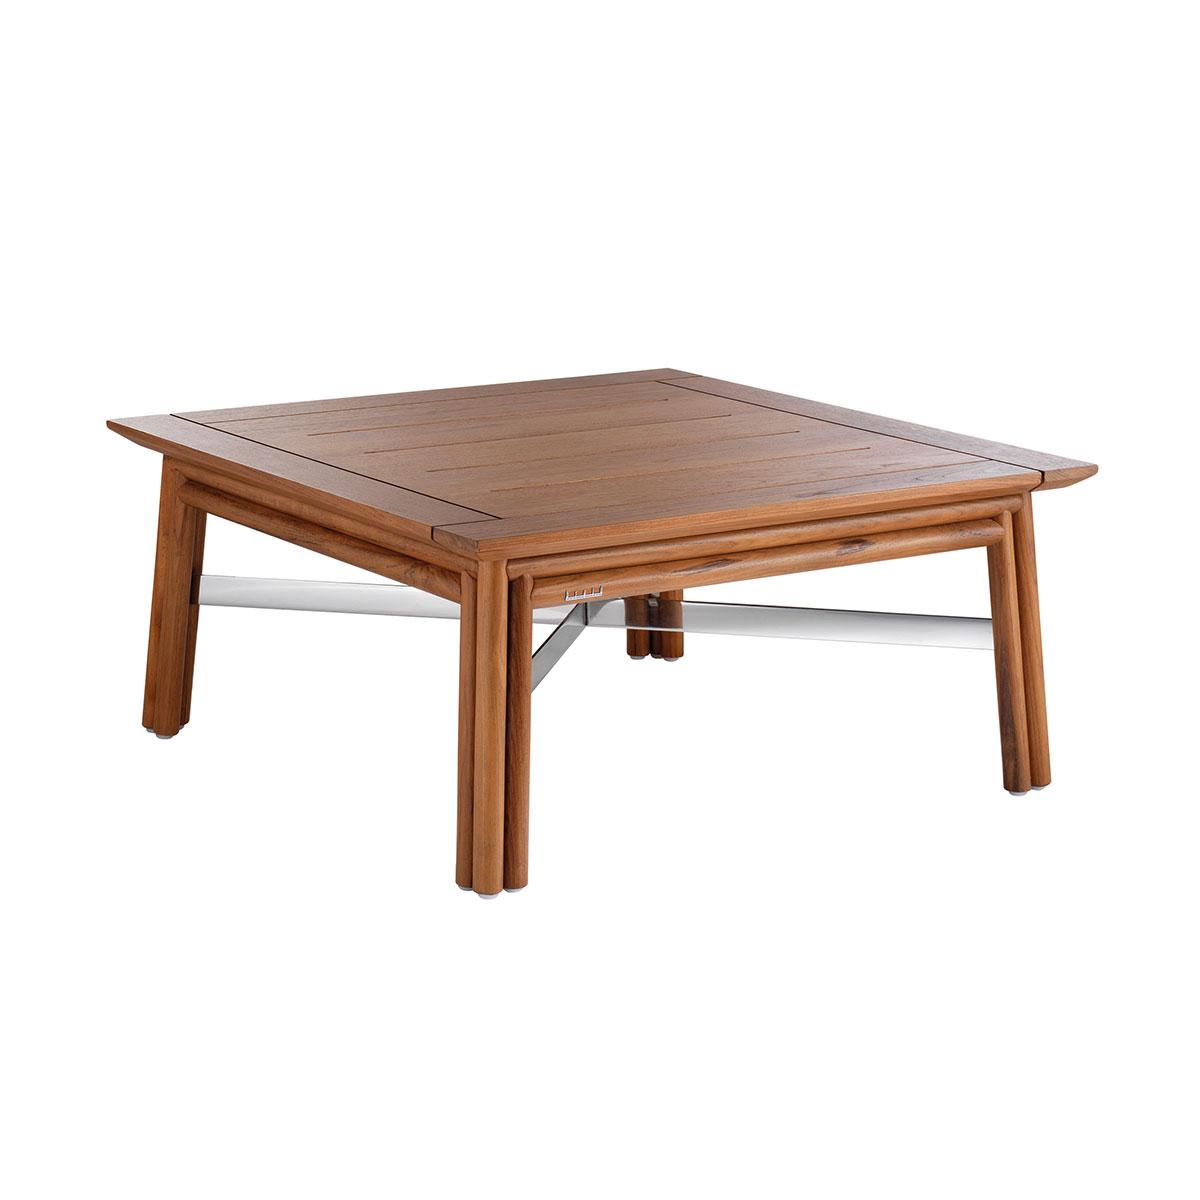 Coffee table Maxim Braid